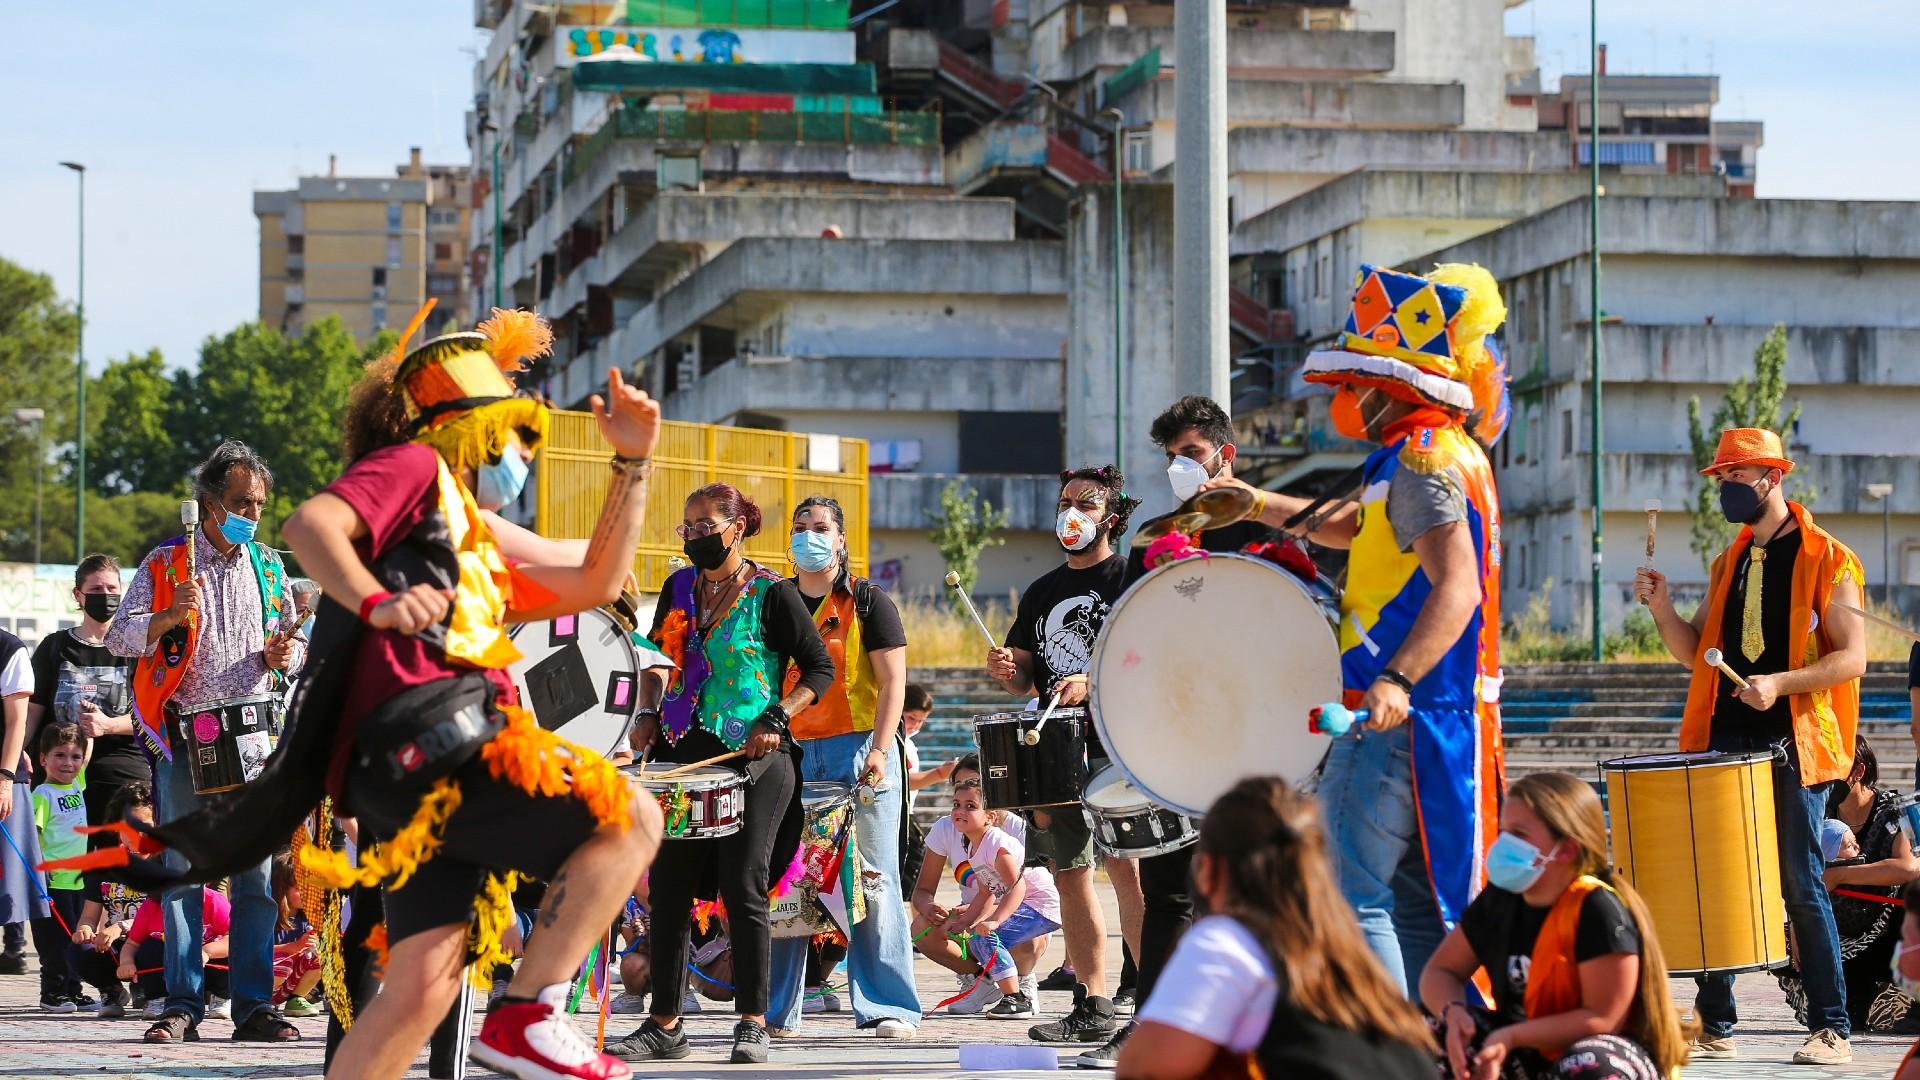 De máscara, italianos participam de flash mob na cidade de Nápoles